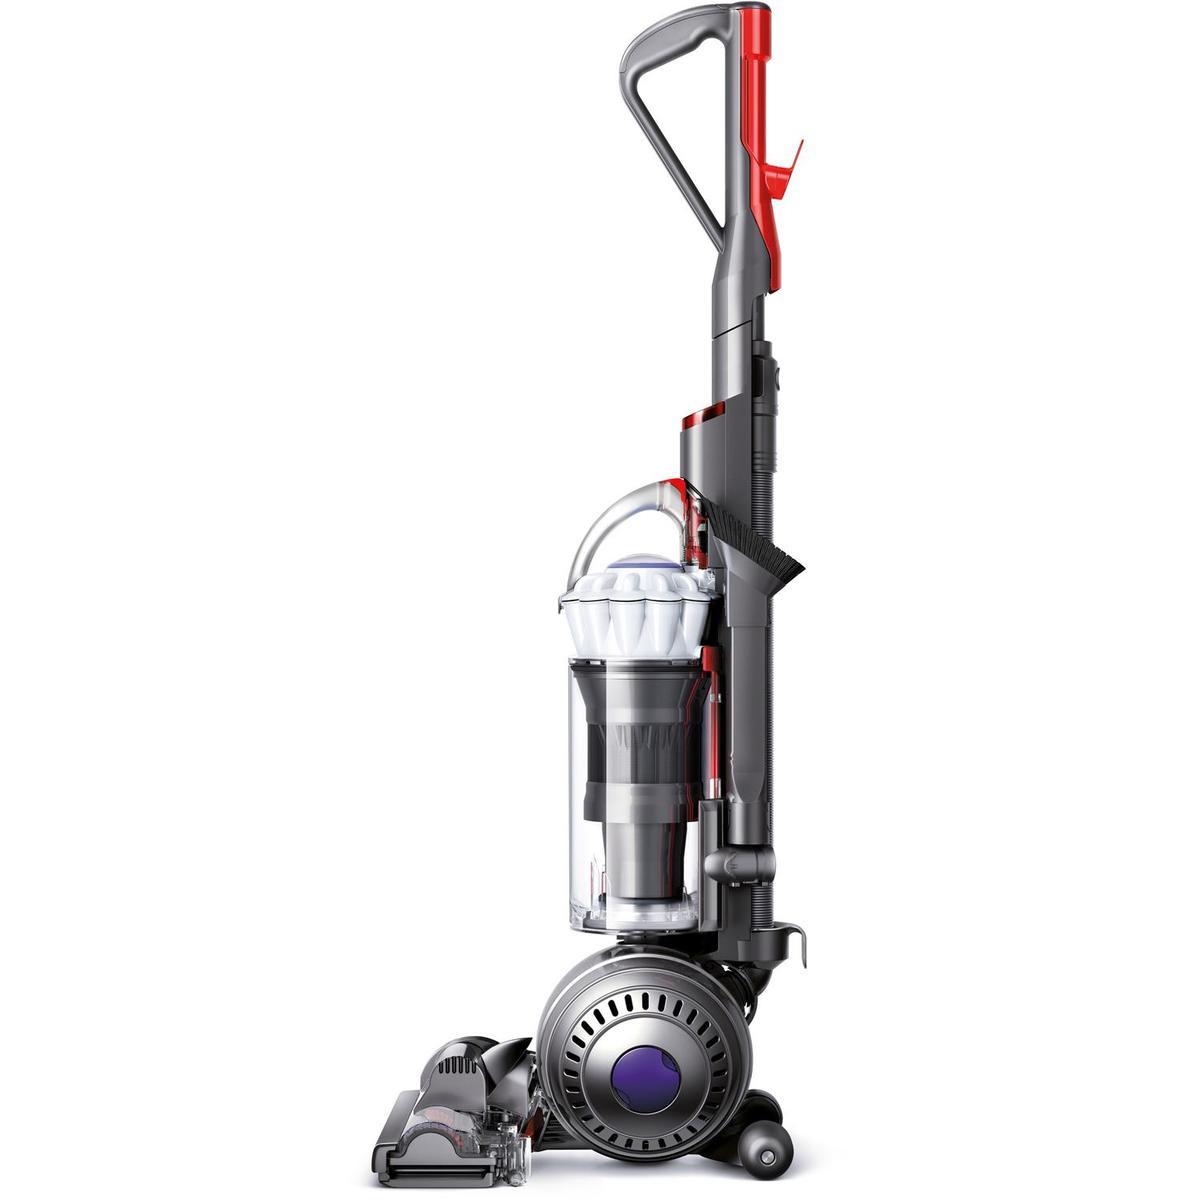 best vacuum for pet hair and hardwood floors 2016 of dyson ball up16 multi floor vacuum cleaner big w with dyson ball up16 multi floor vacuum cleaner